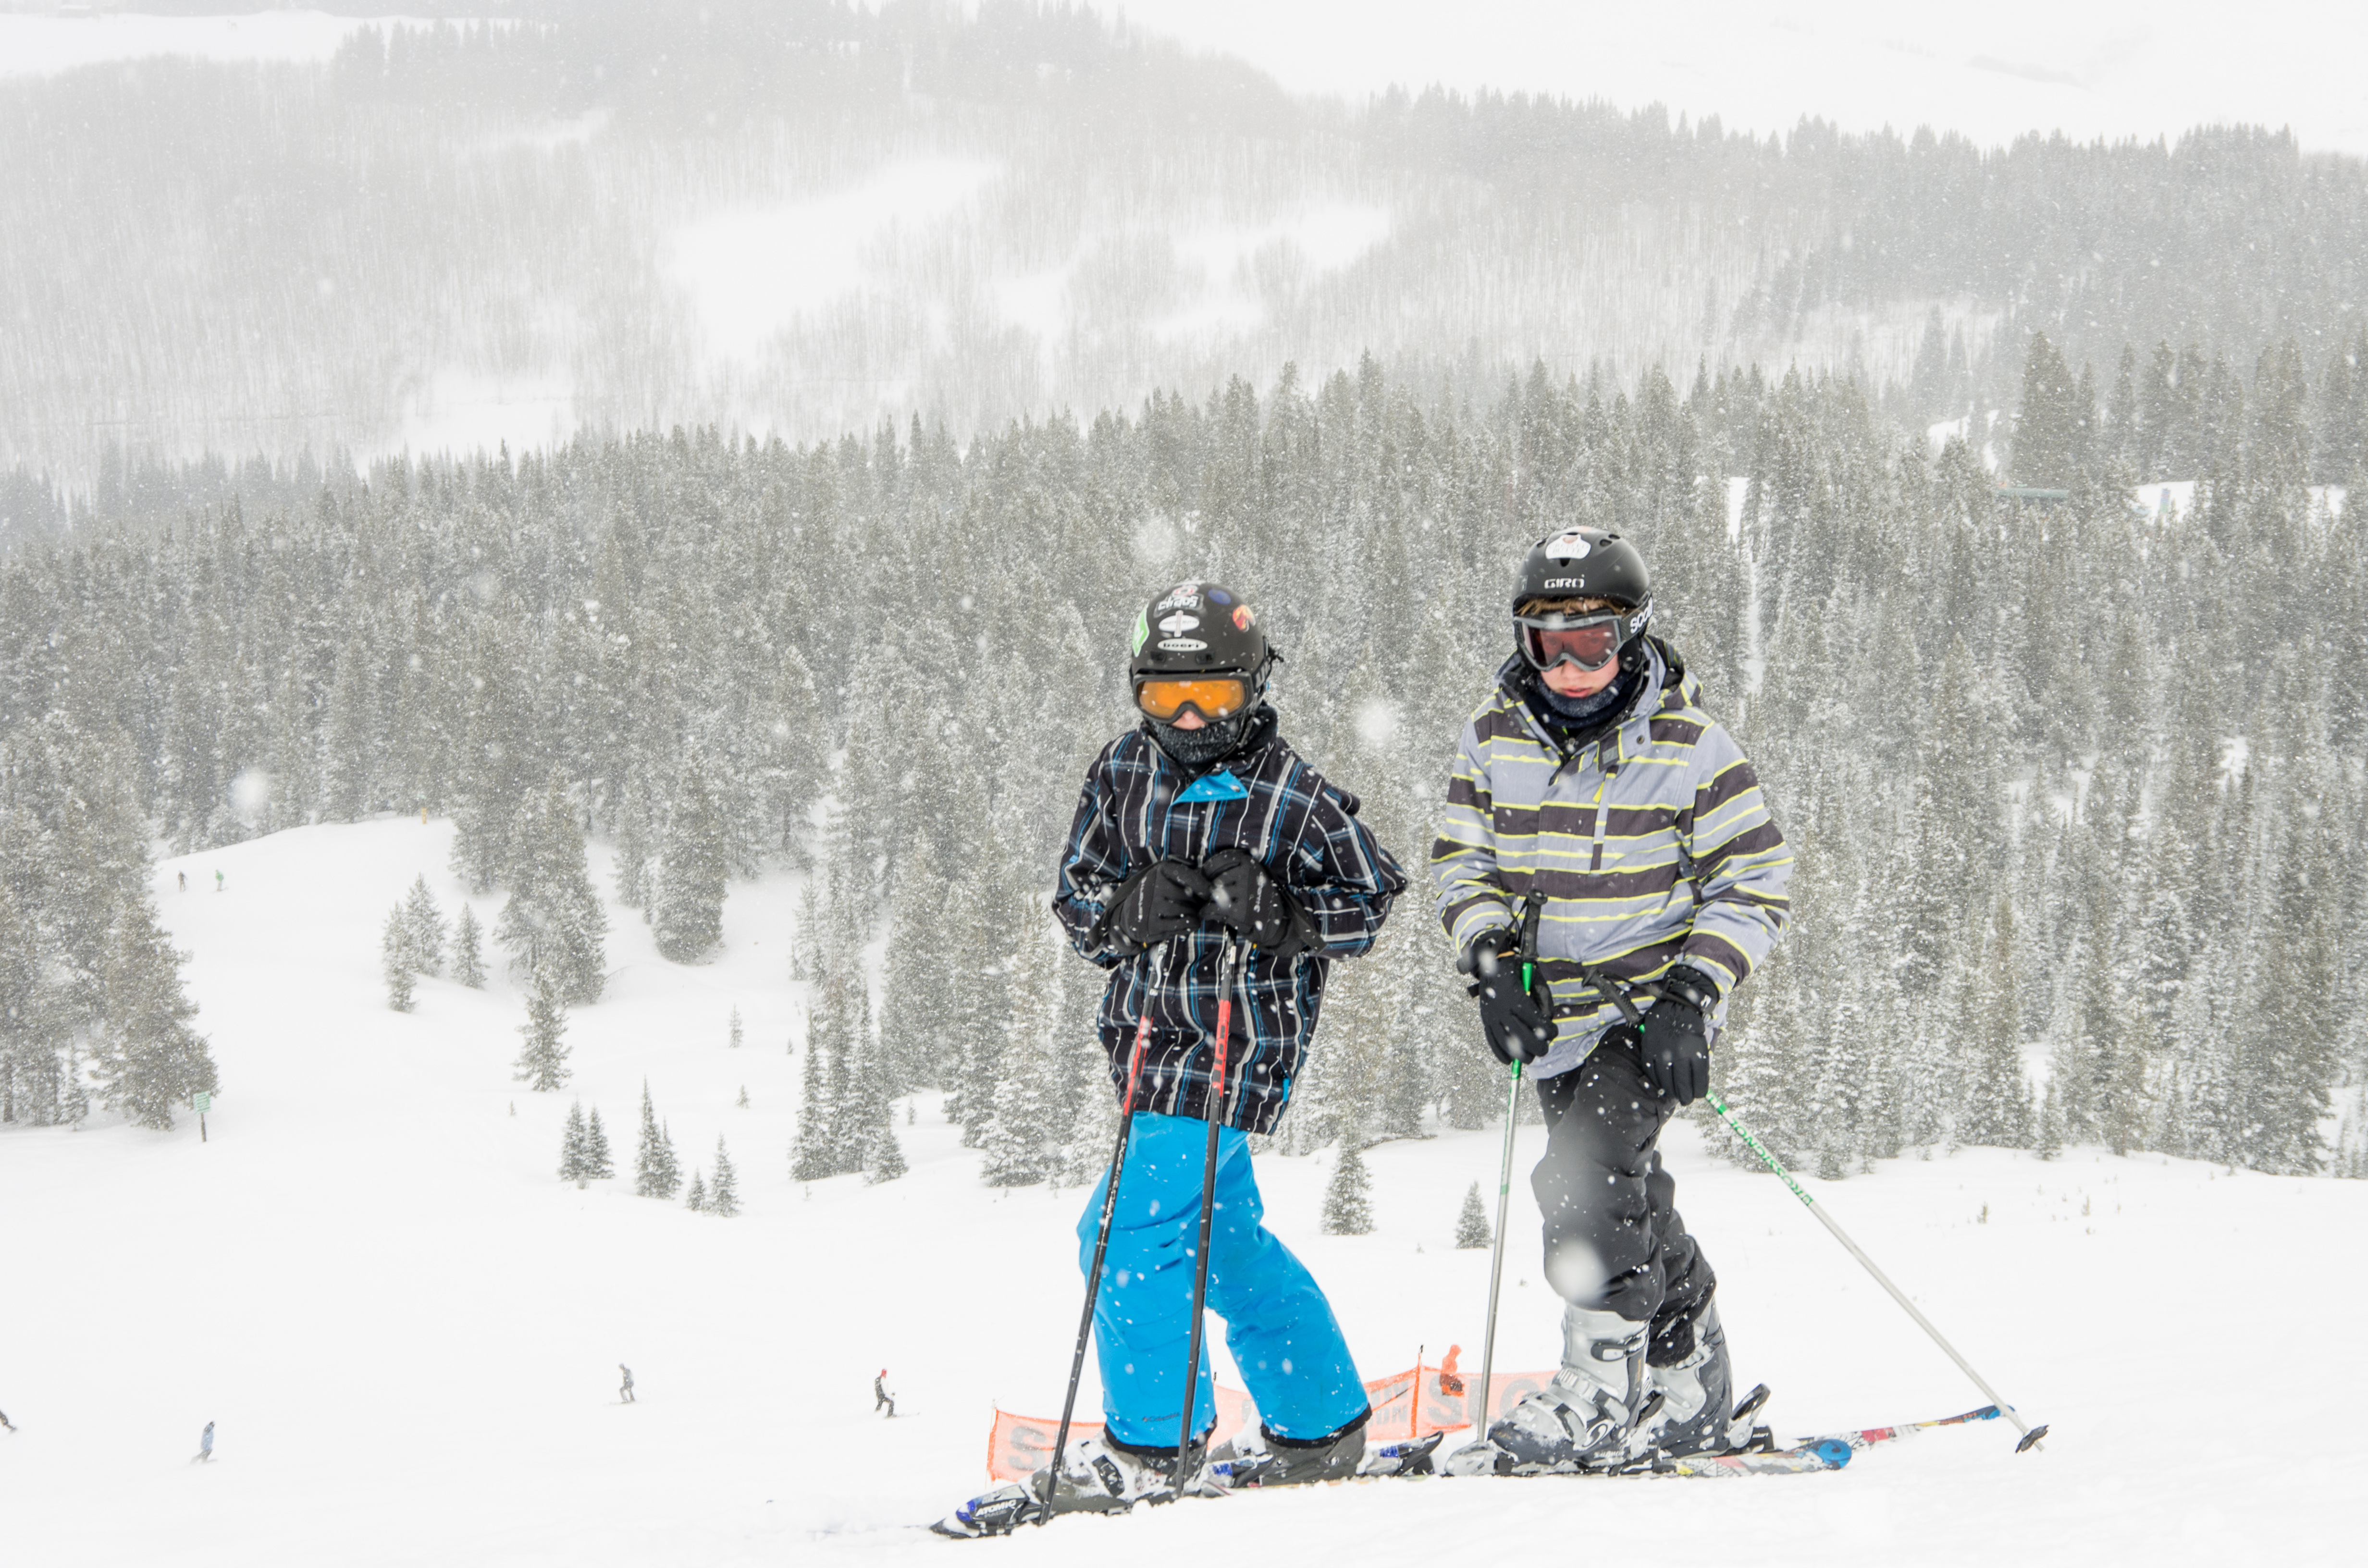 sexy-christian-teen-ski-retreats-in-virginia-dolls-pussy